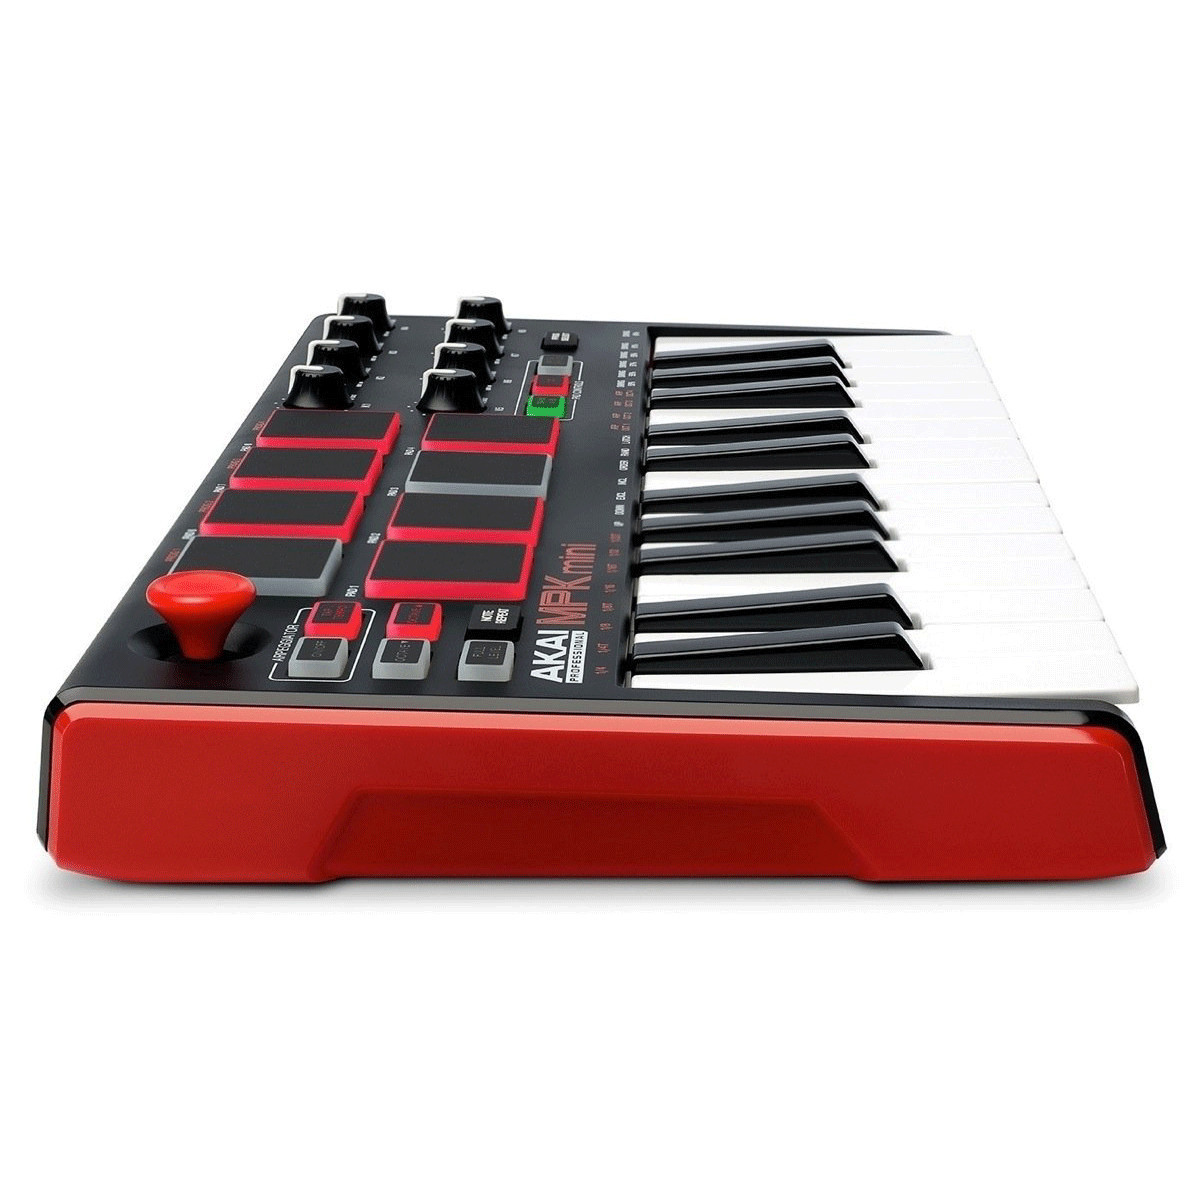 akai mpk mini mk 2 laptop production keyboard at. Black Bedroom Furniture Sets. Home Design Ideas